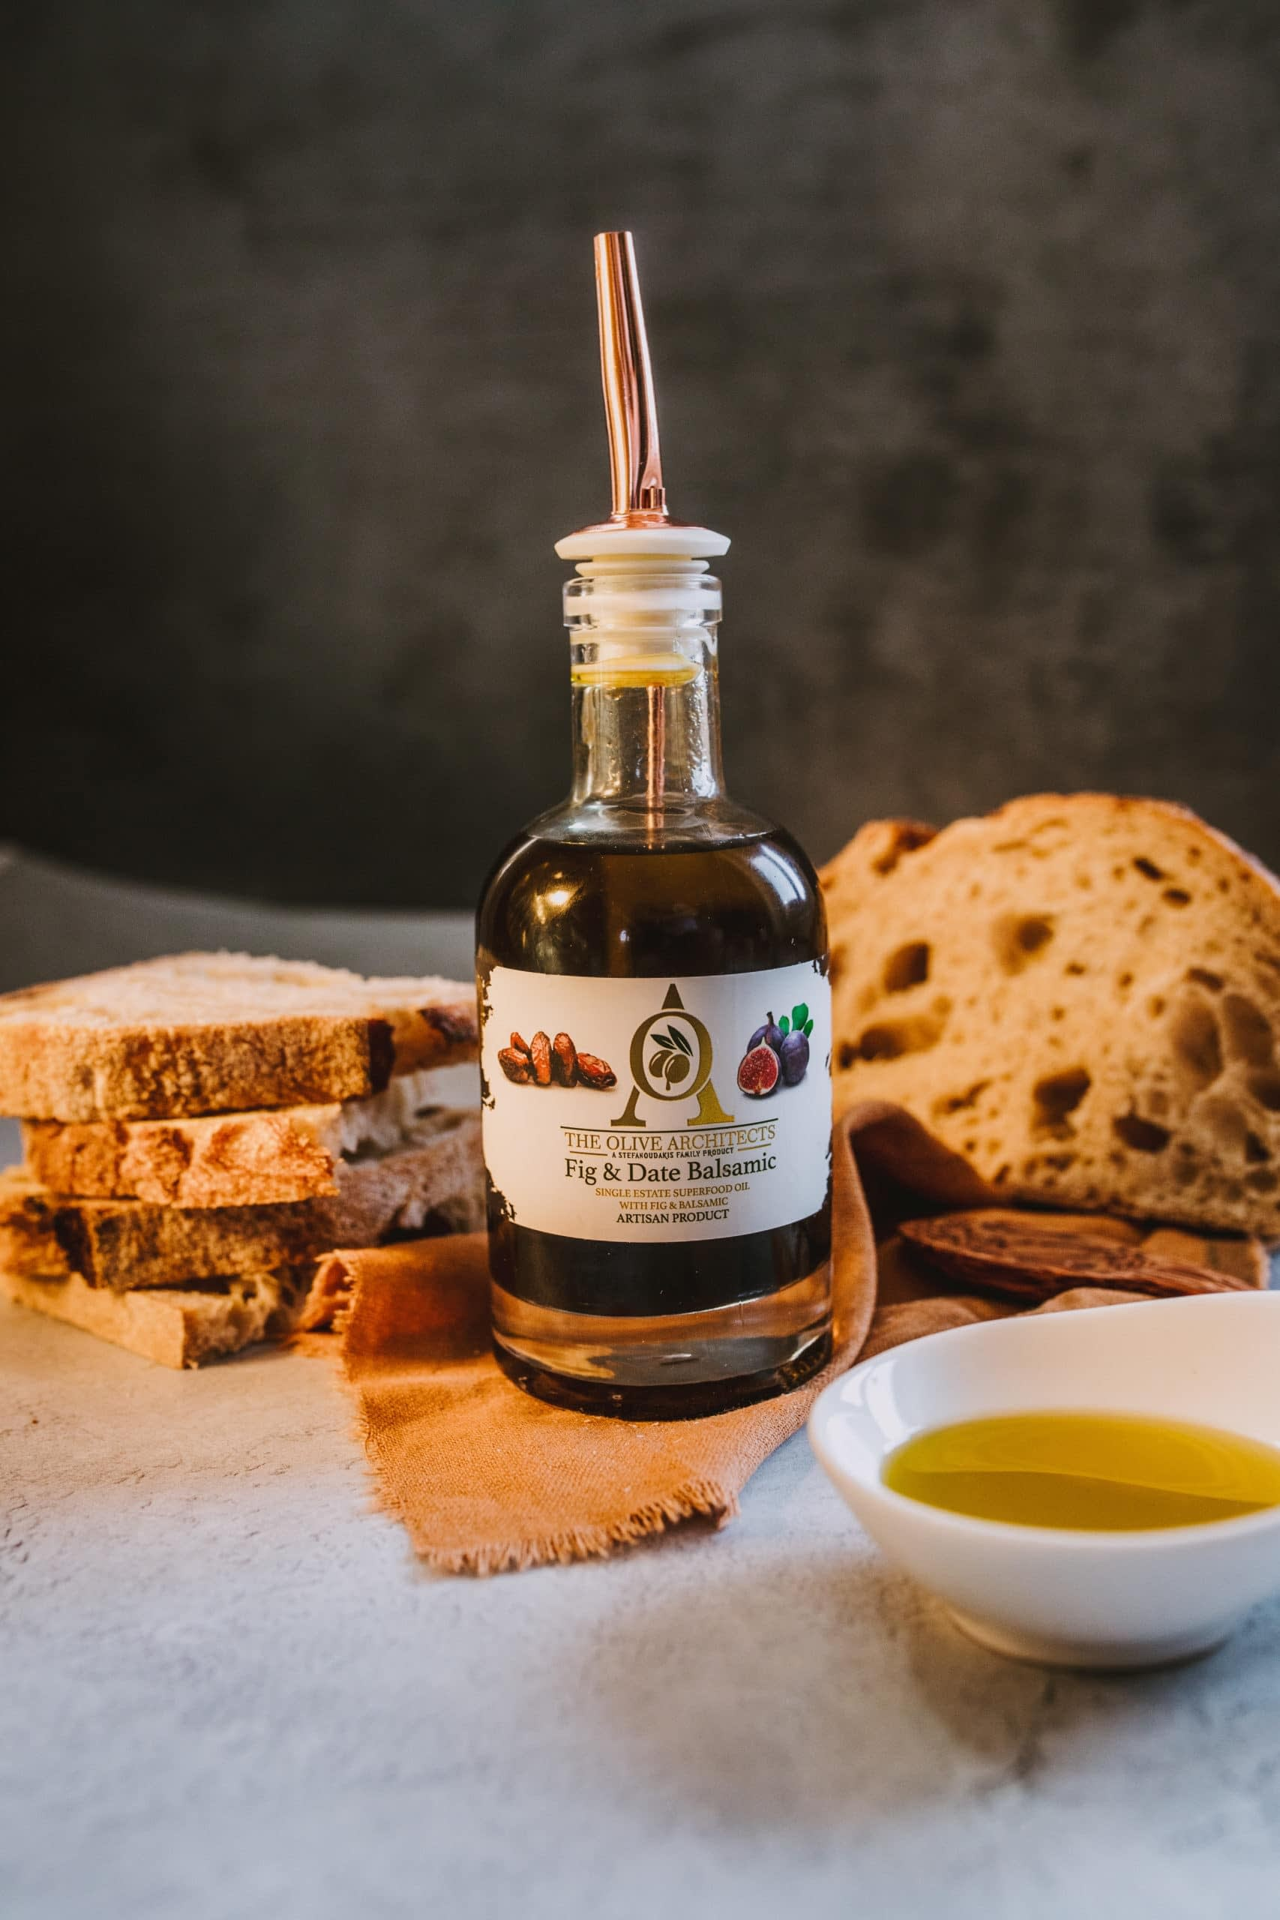 Extra virgin Fig & Date oil